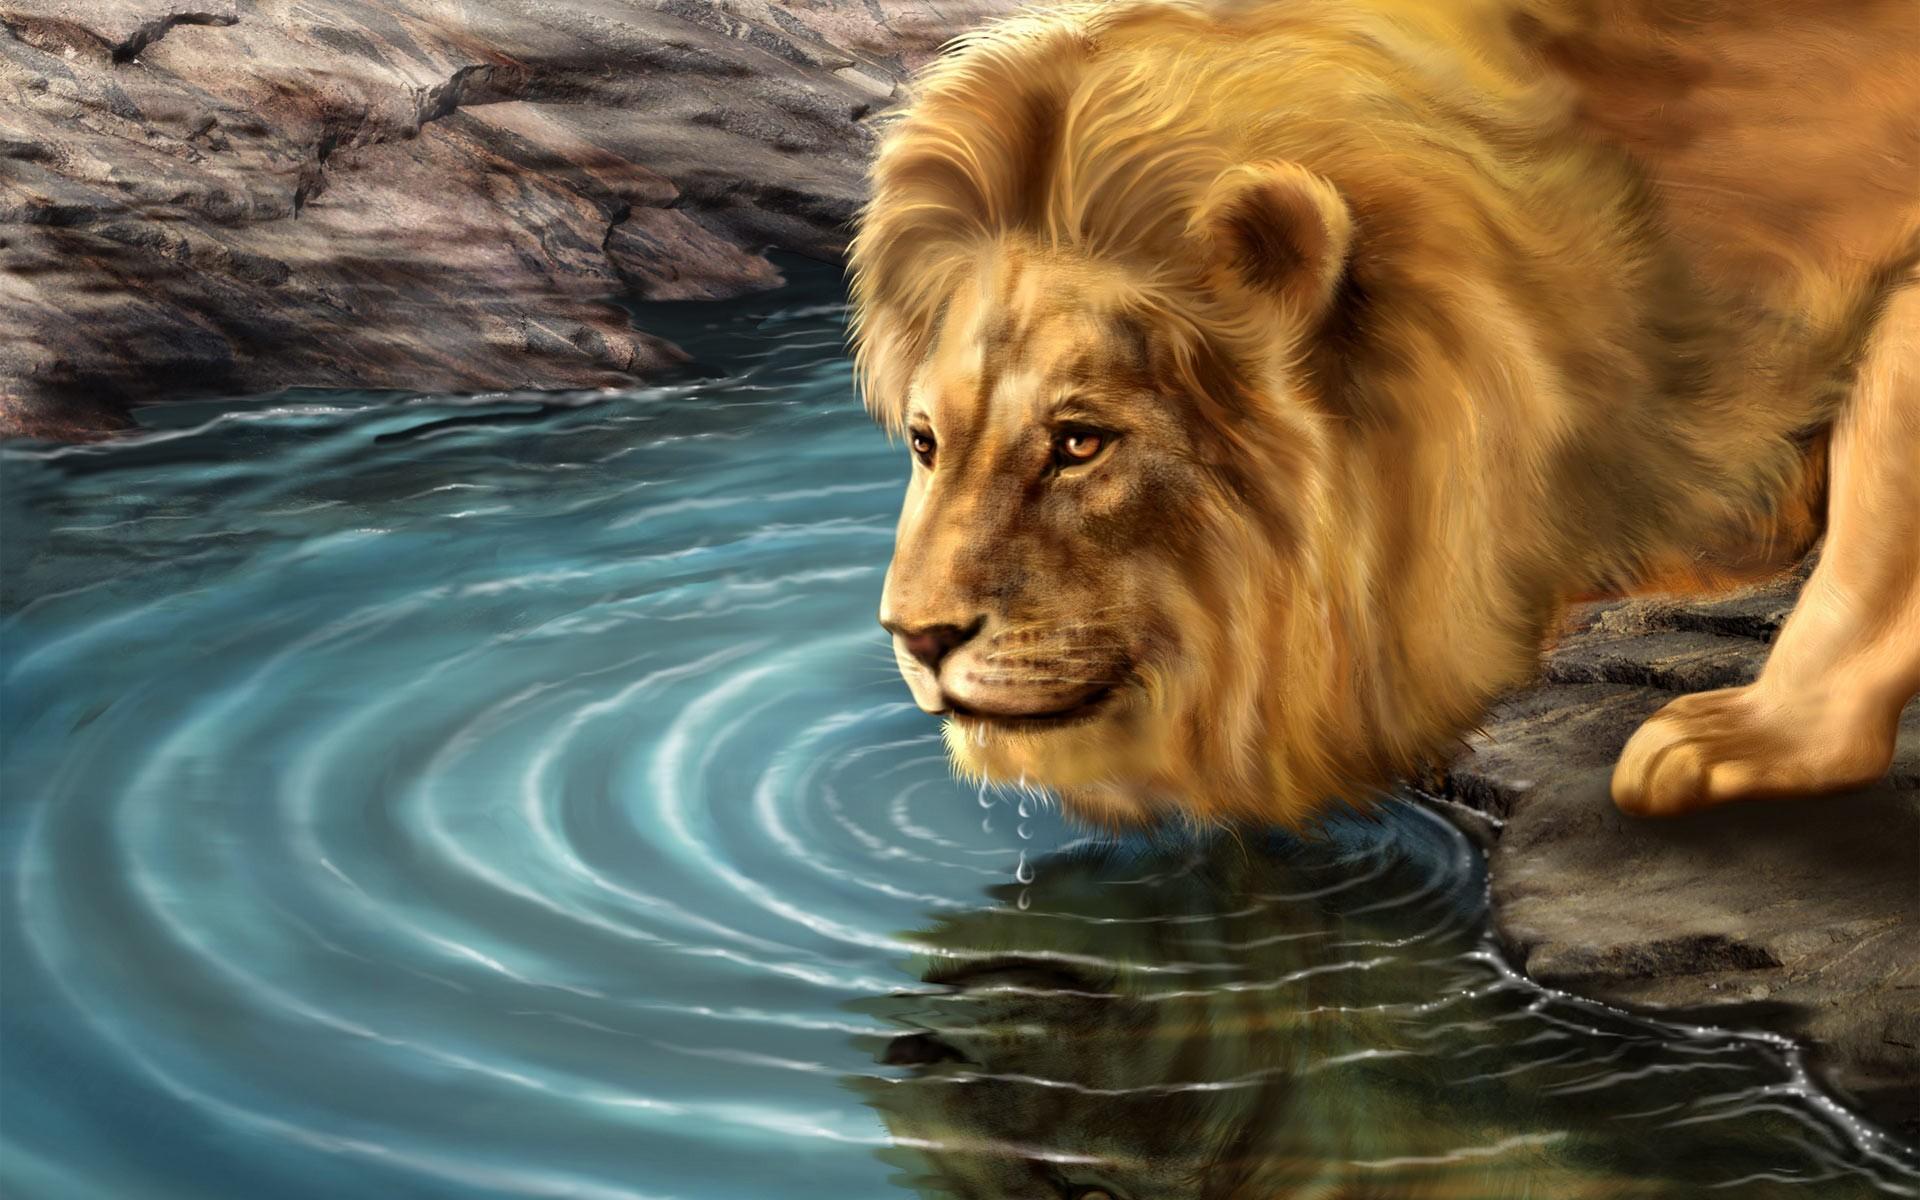 Lion lion water drinking hd wallpapers.jpg – World HD Wallpapers